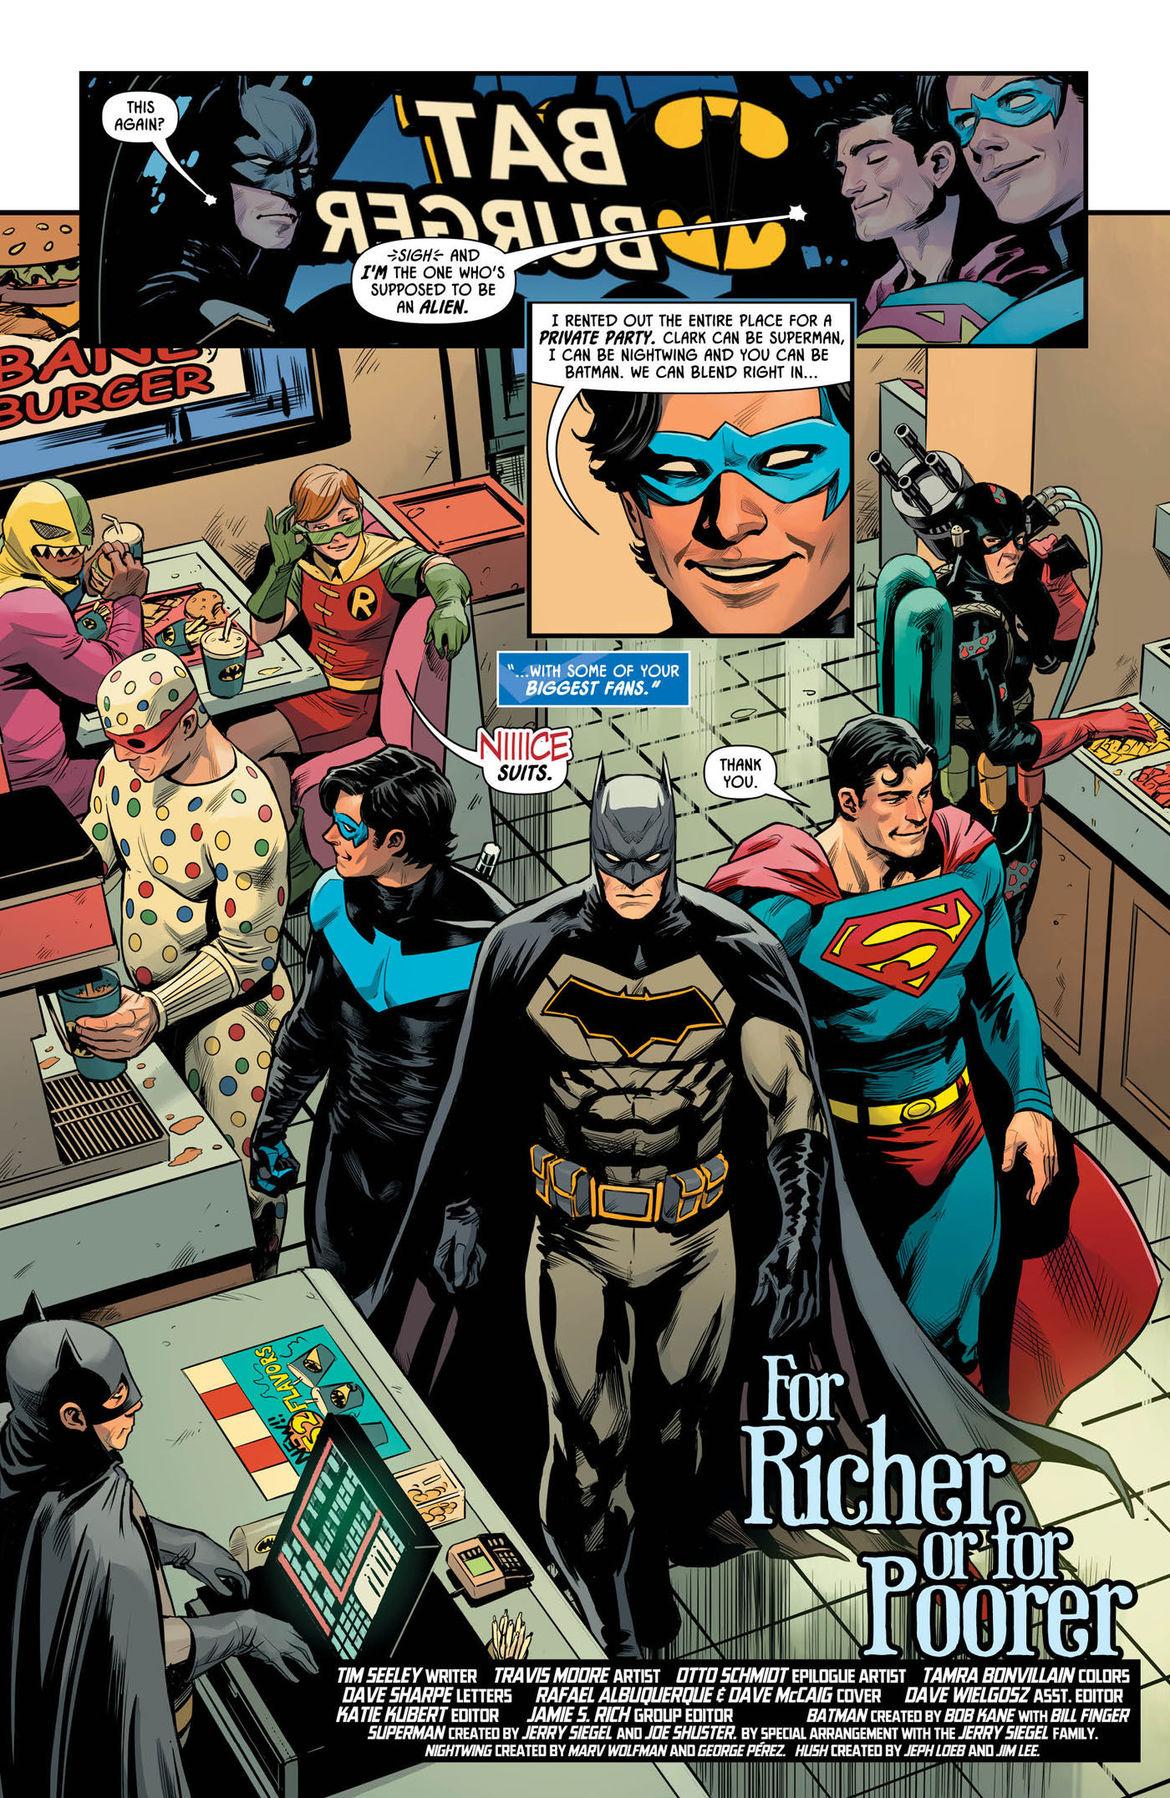 Batman Prelude to the Wedding Nightwing vs Hush 1 page 2